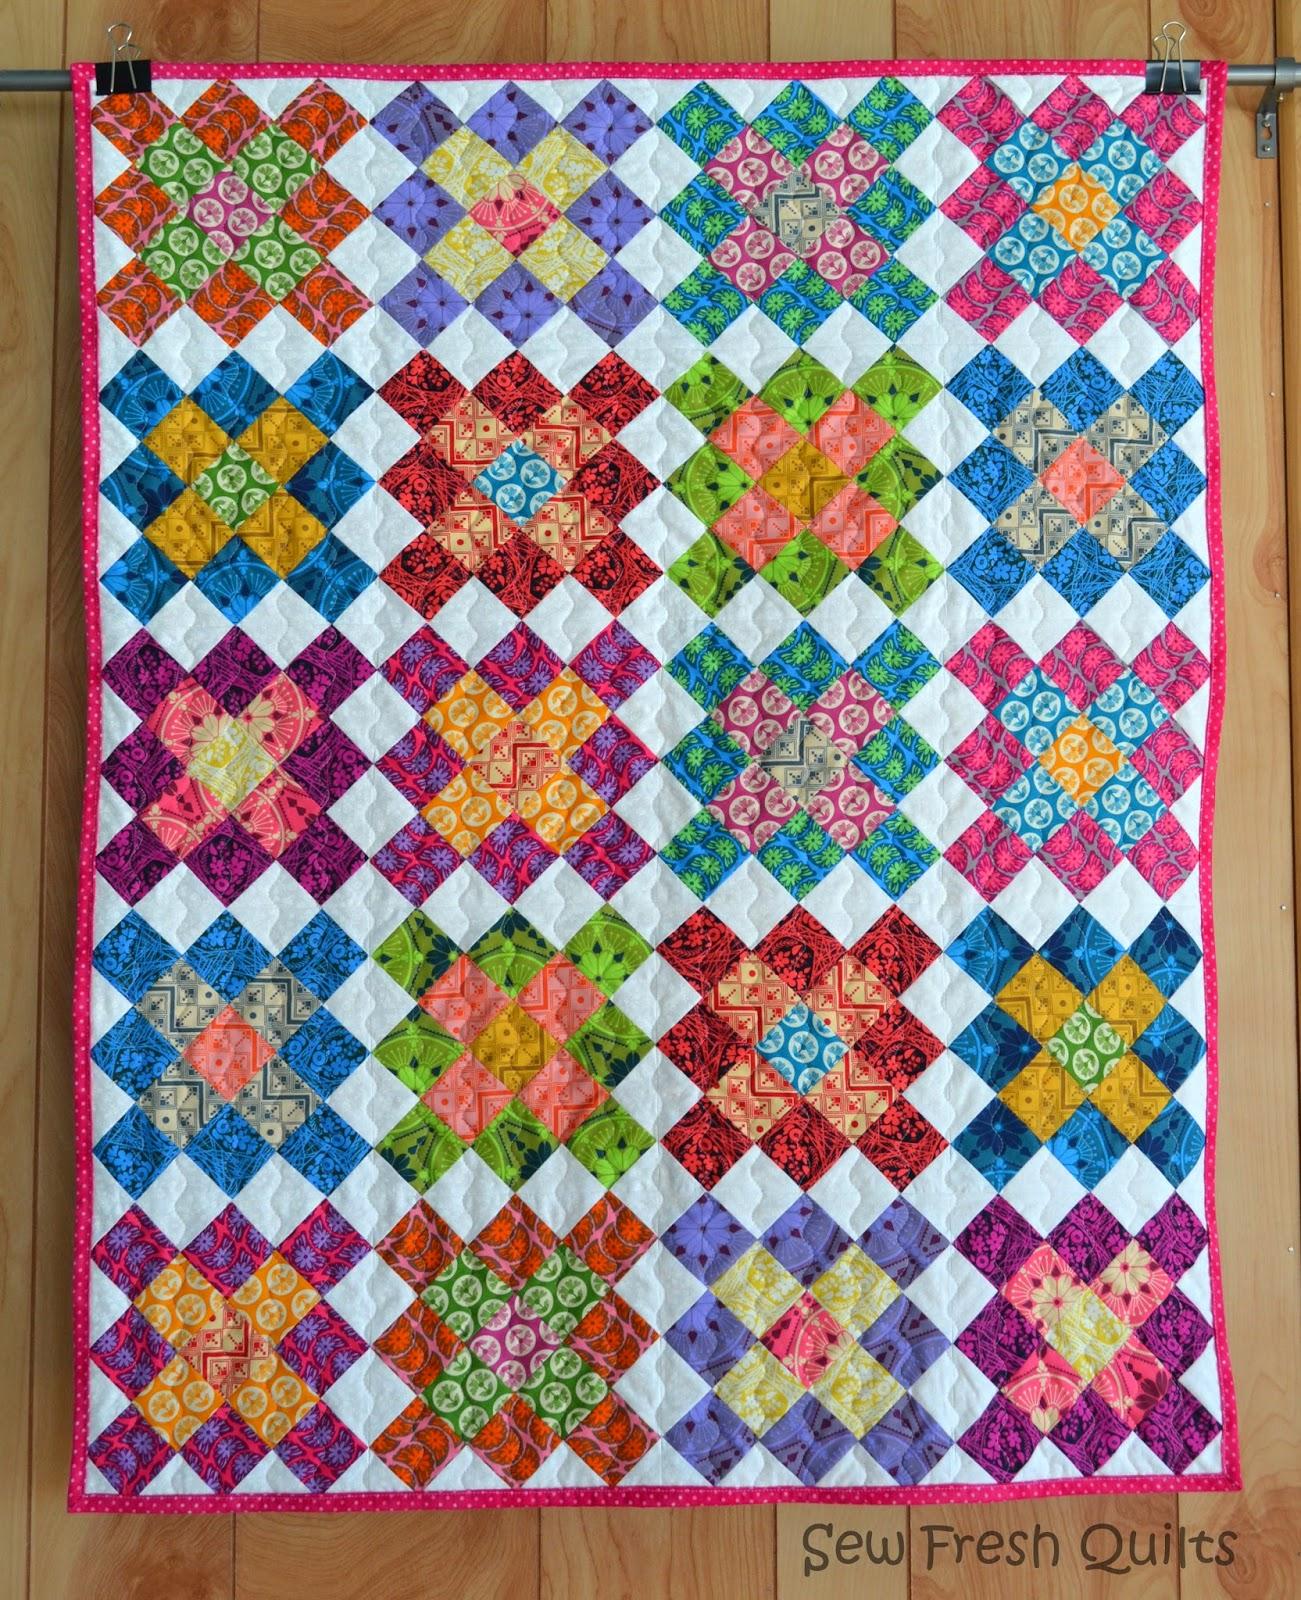 http://sewfreshquilts.blogspot.ca/2014/03/granny-square-quilt-blocks.html